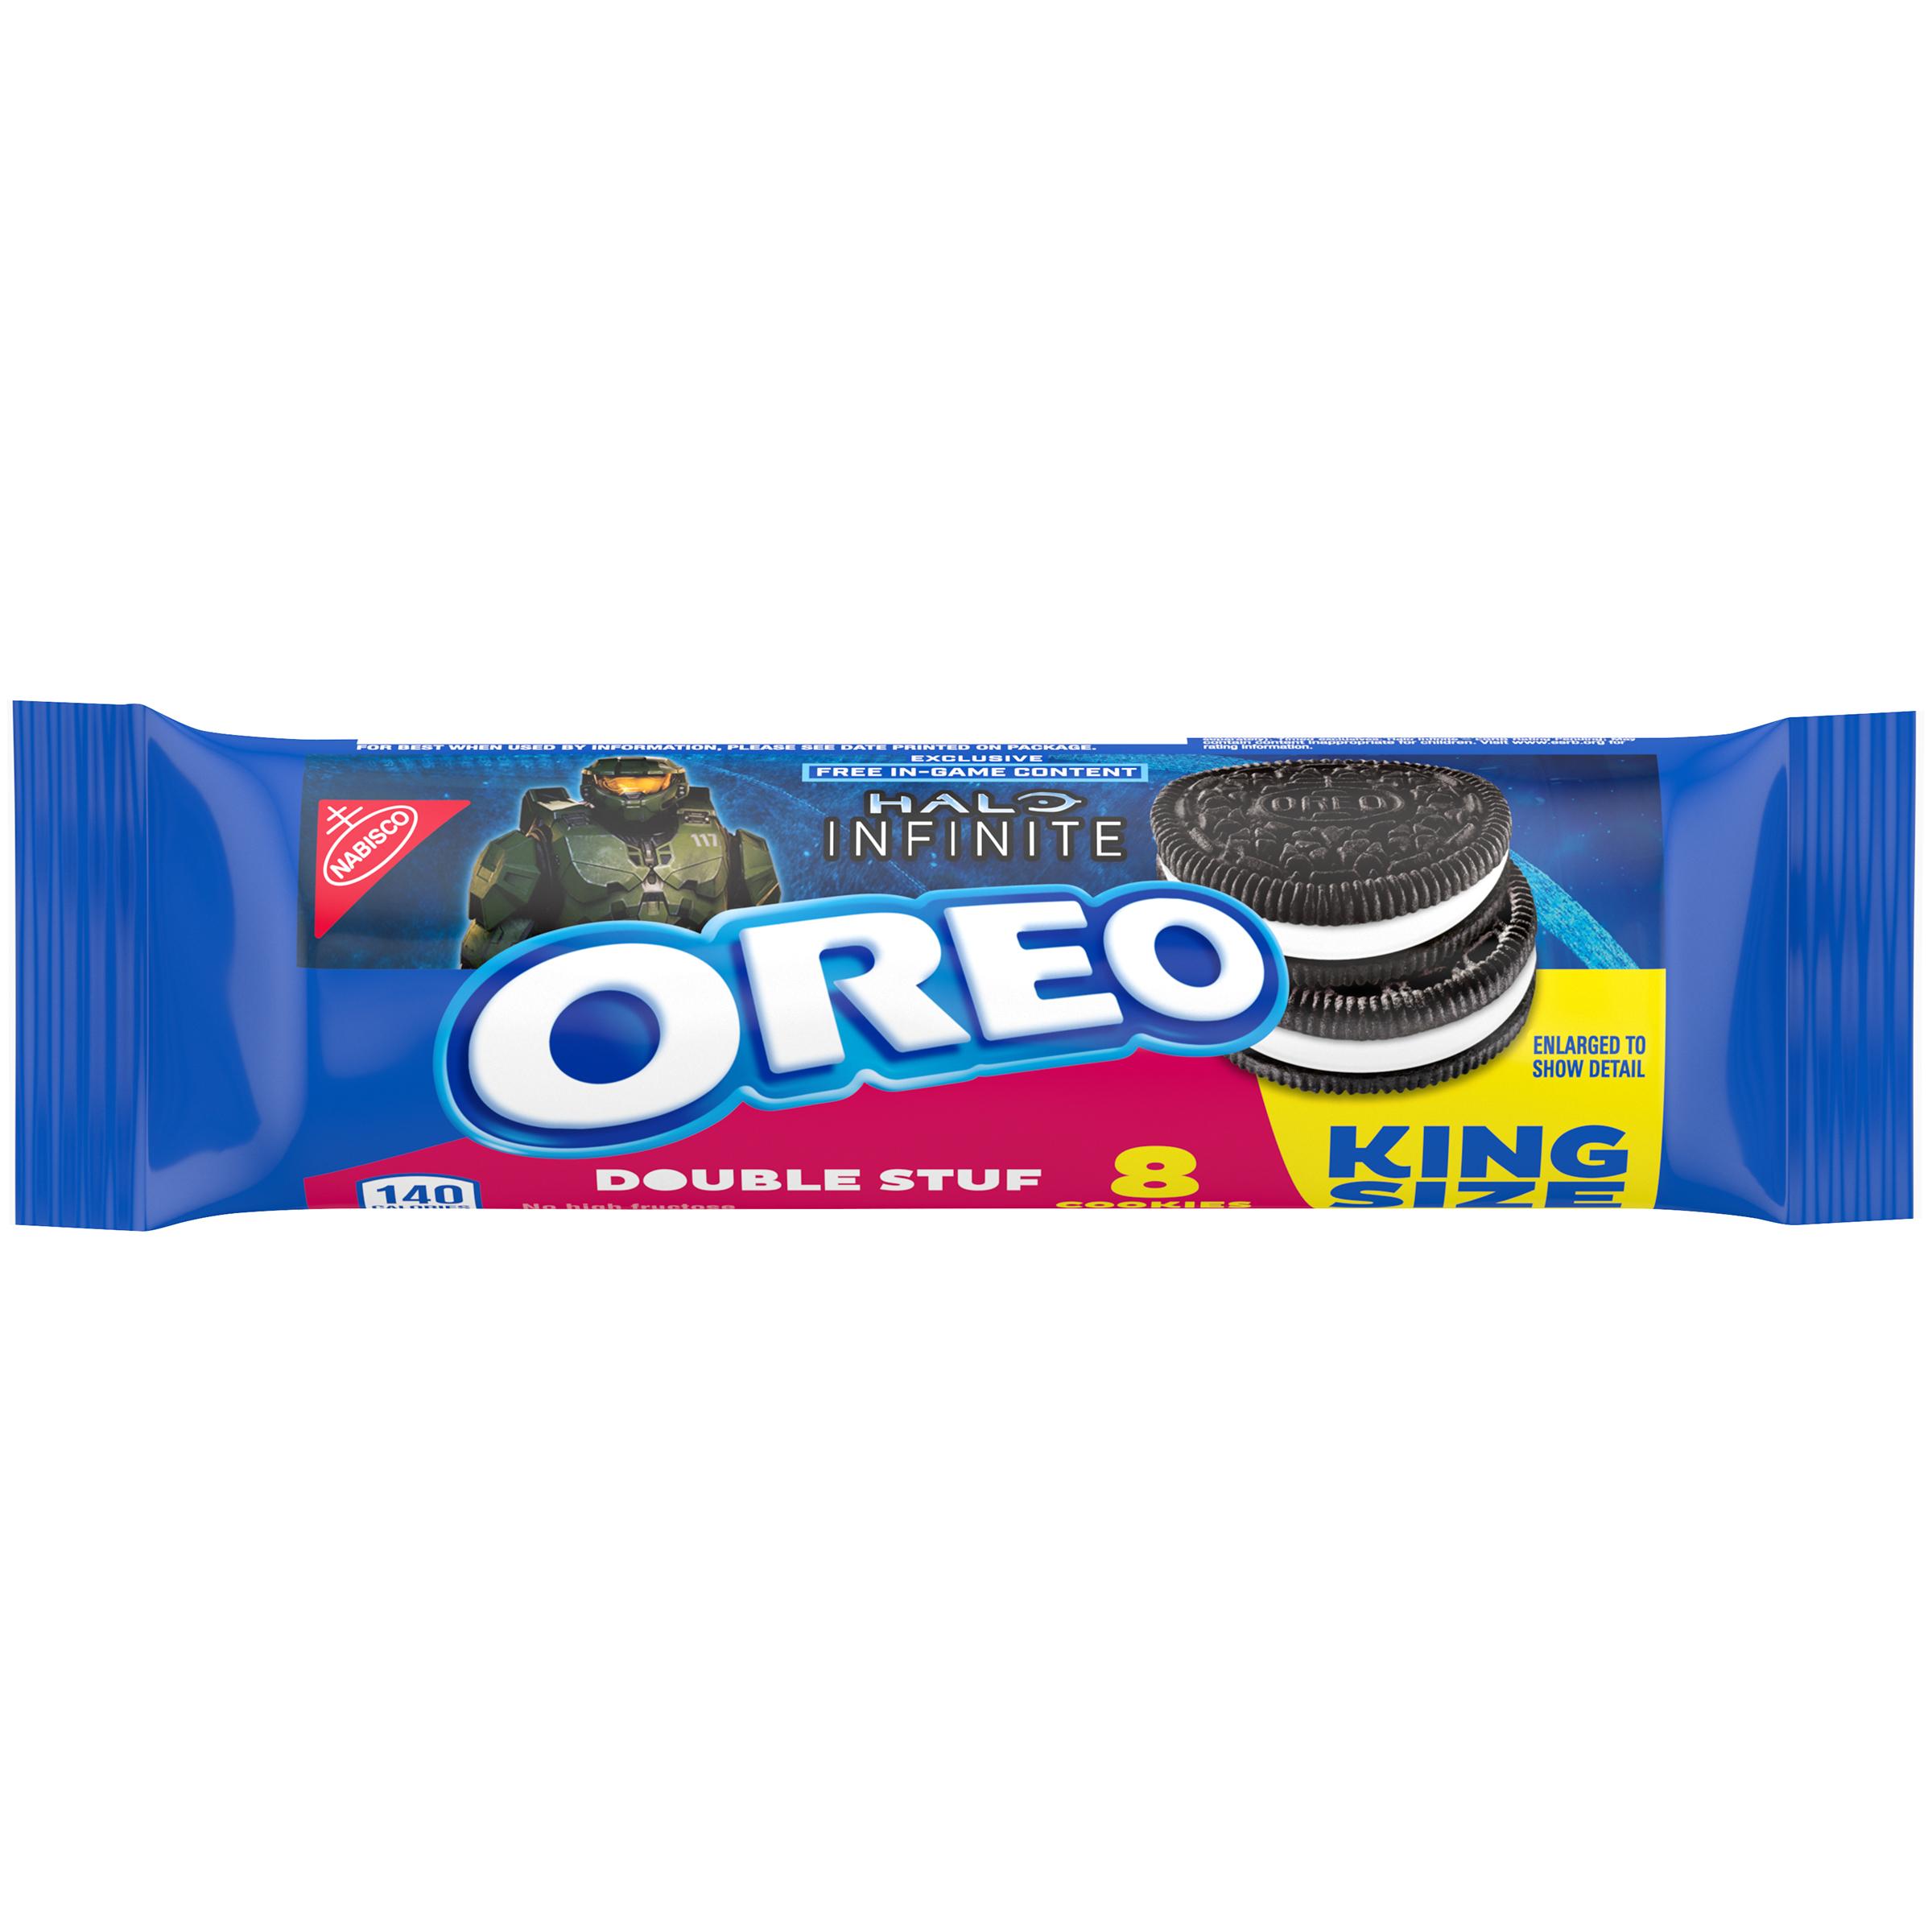 OREO Double Stuf Cookies 4.1 oz